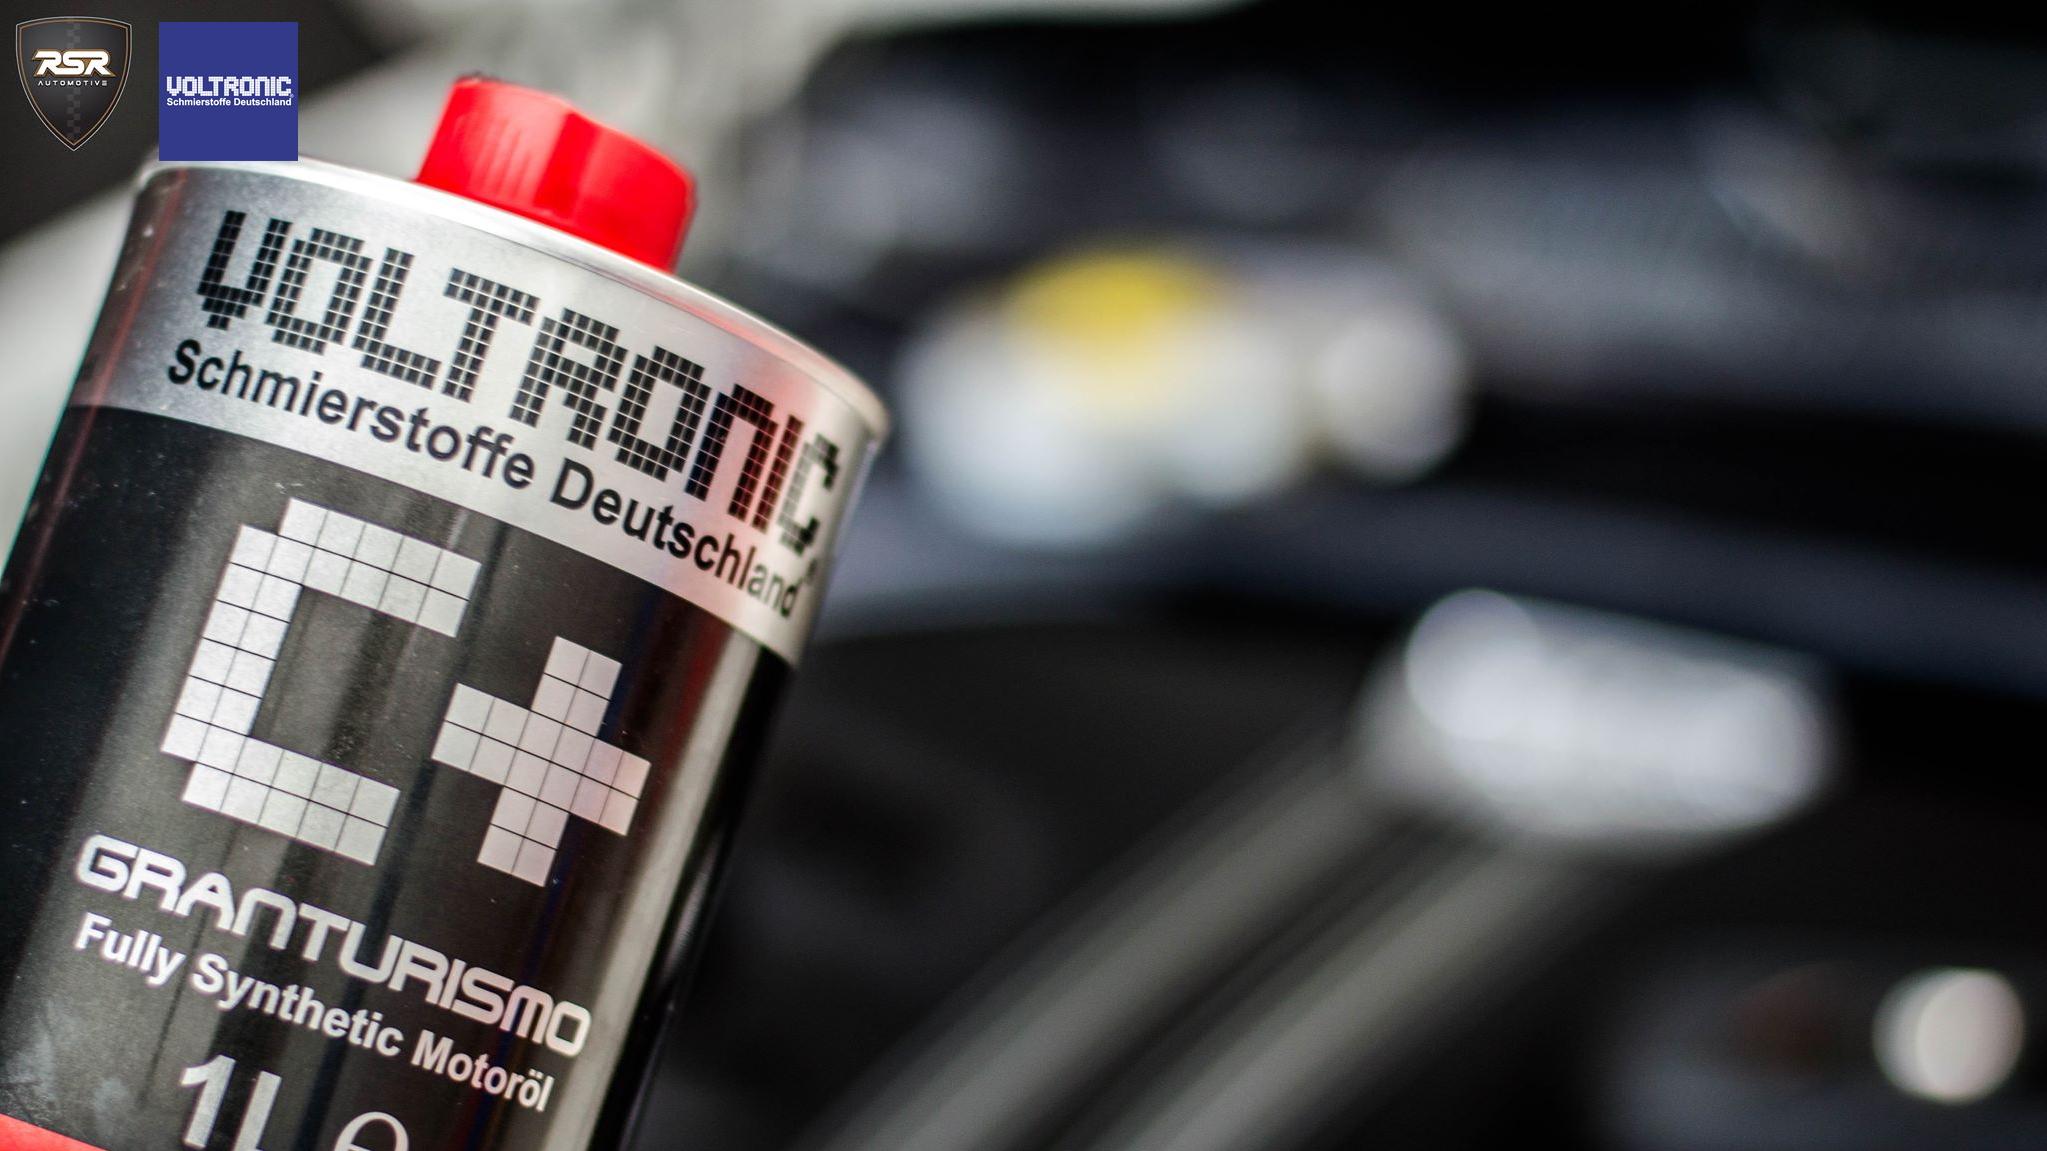 voltronic-granturismo-c-voltronic-engine-oil-41